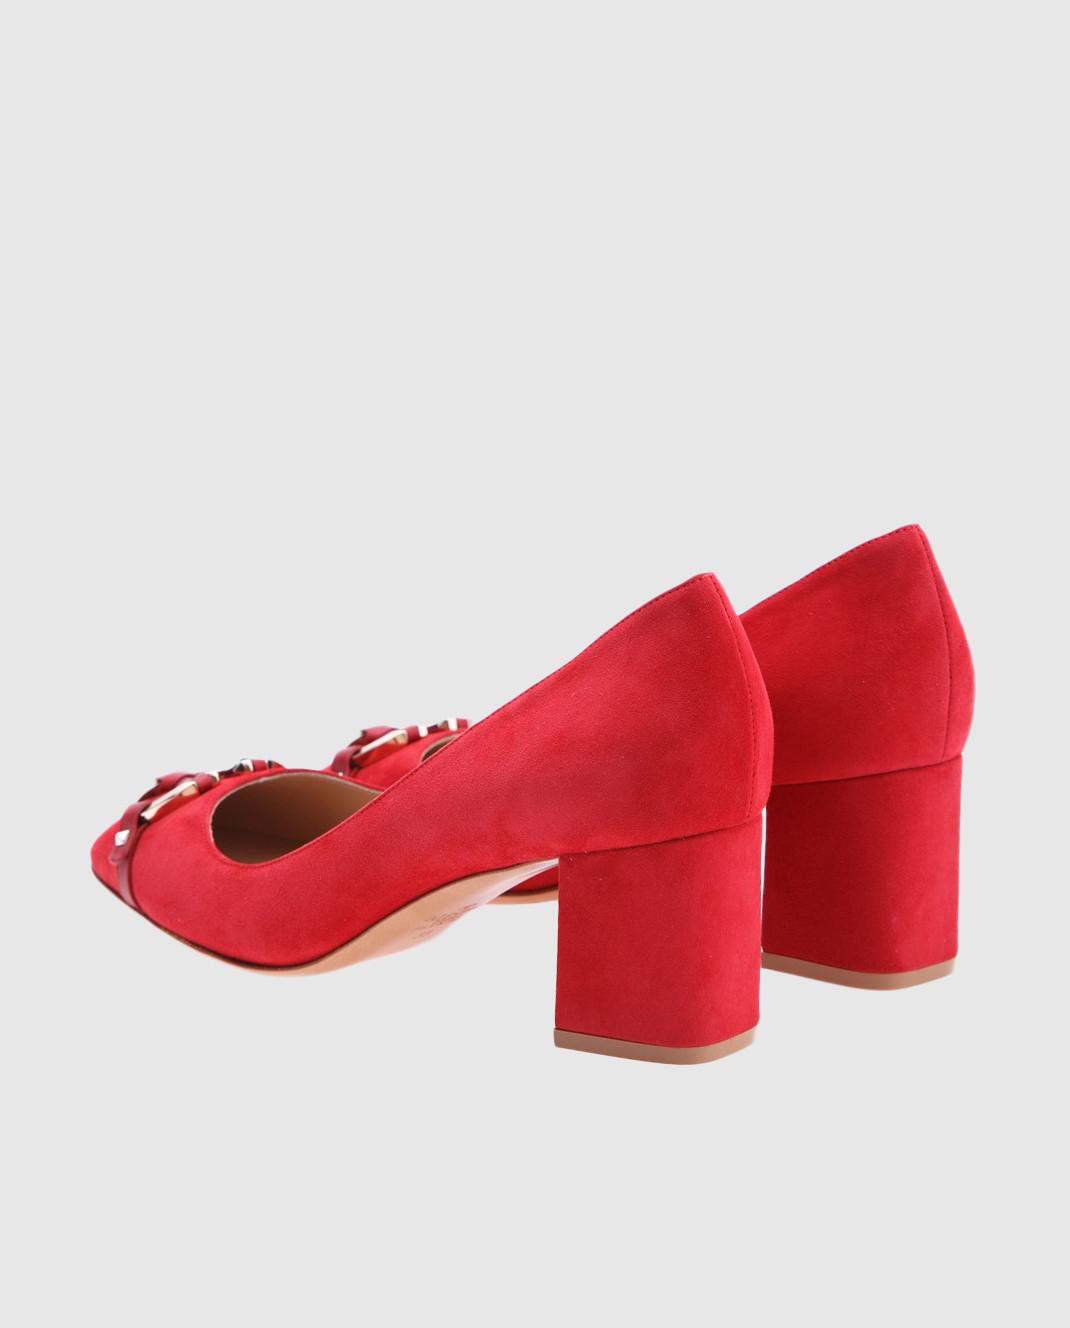 Valentino Красные туфли из замши PW2S0E93ZUR изображение 3